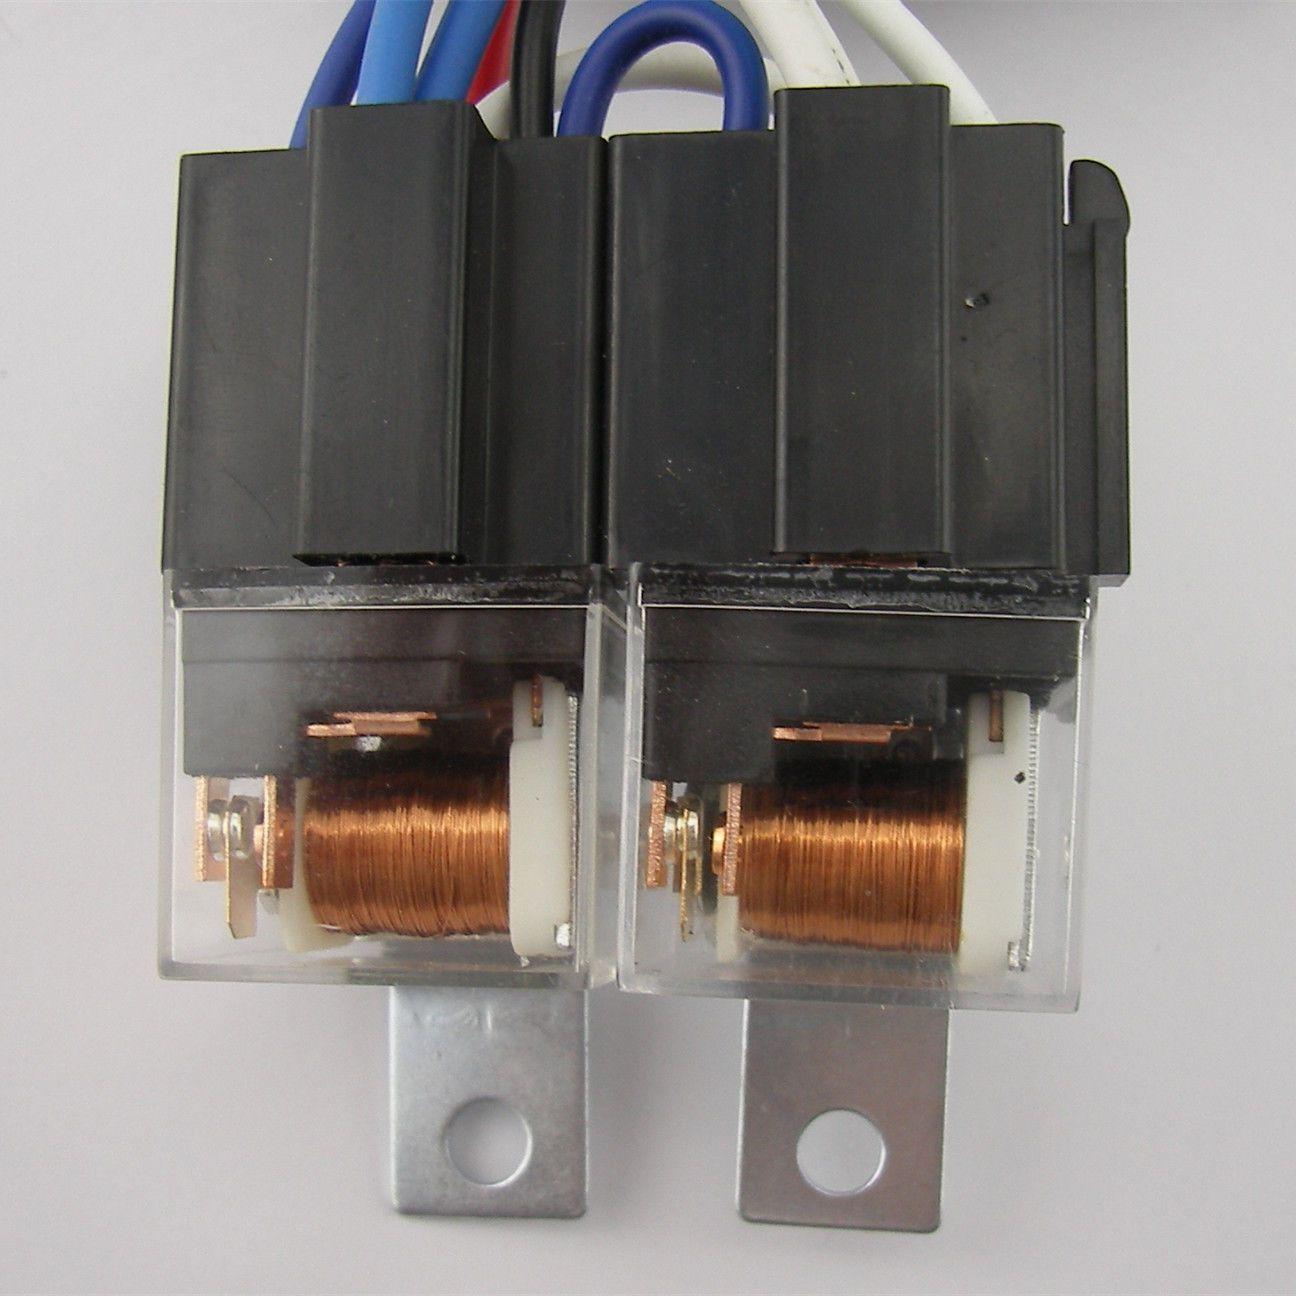 Oem H4 Headlight Relay Wiring Harnes System 4 Headl Light Bulb